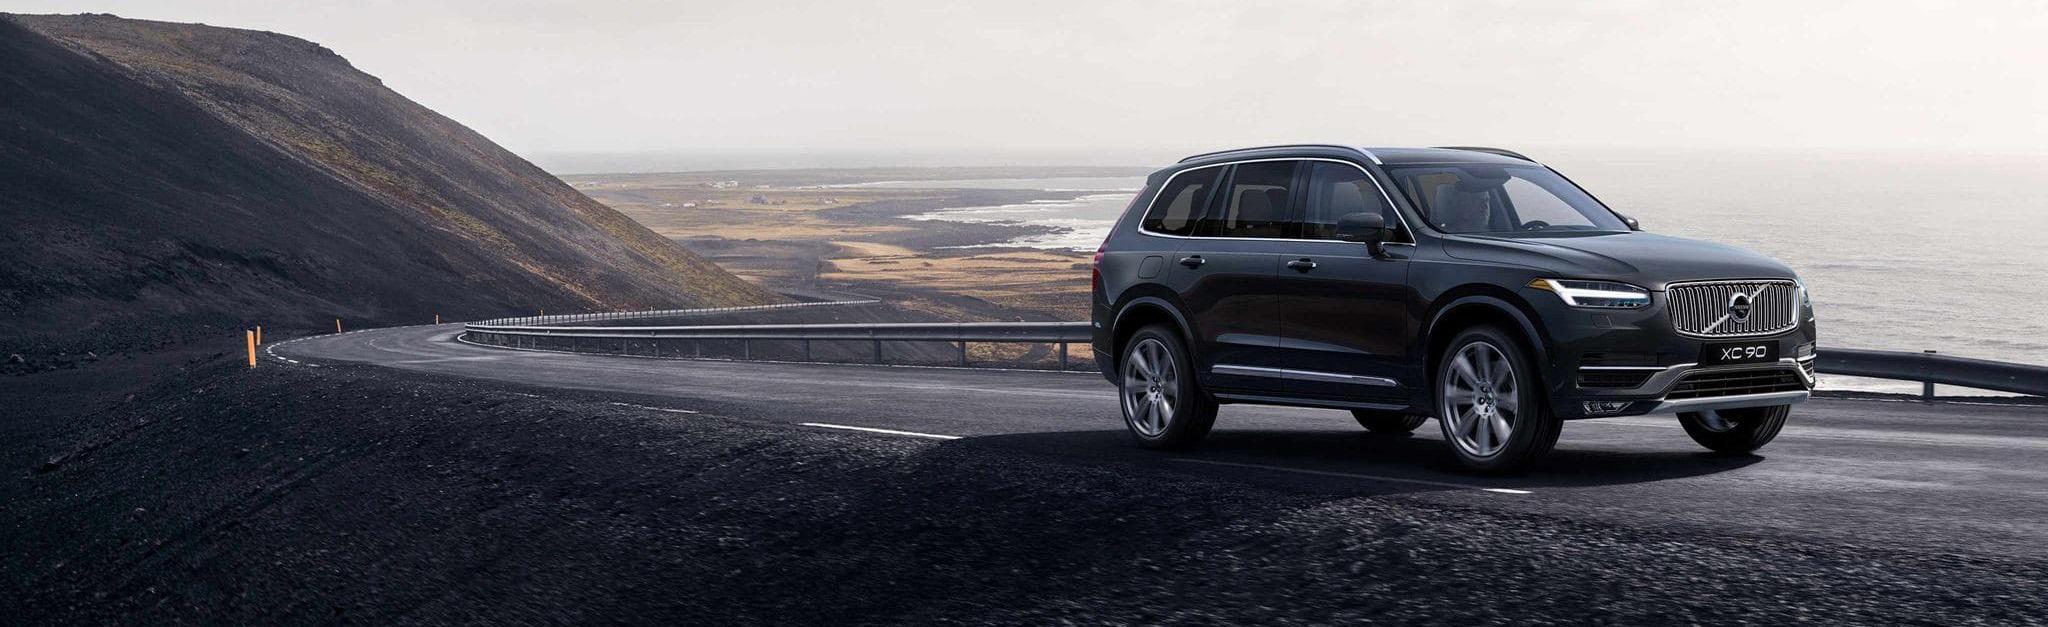 Volvo Certified Pre Owned Vehicles For Sale In Van Nuys Near Los